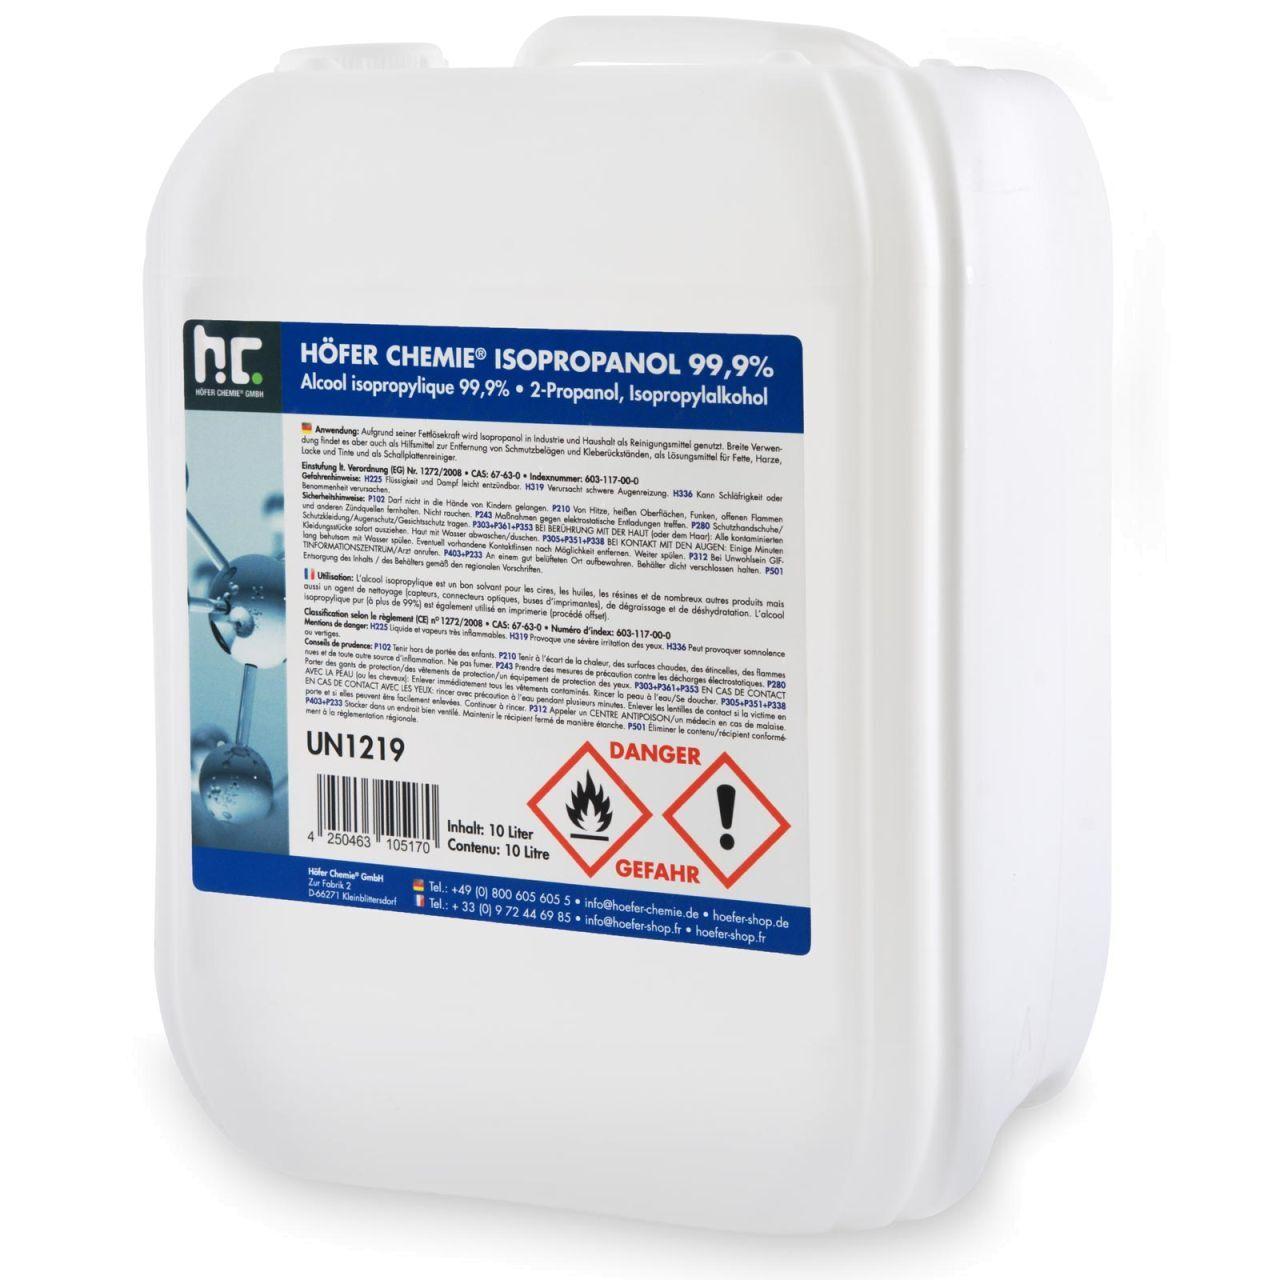 Höfer Chemie 10 l Alcool isopropylique 99,9 % (1 x 10 l)